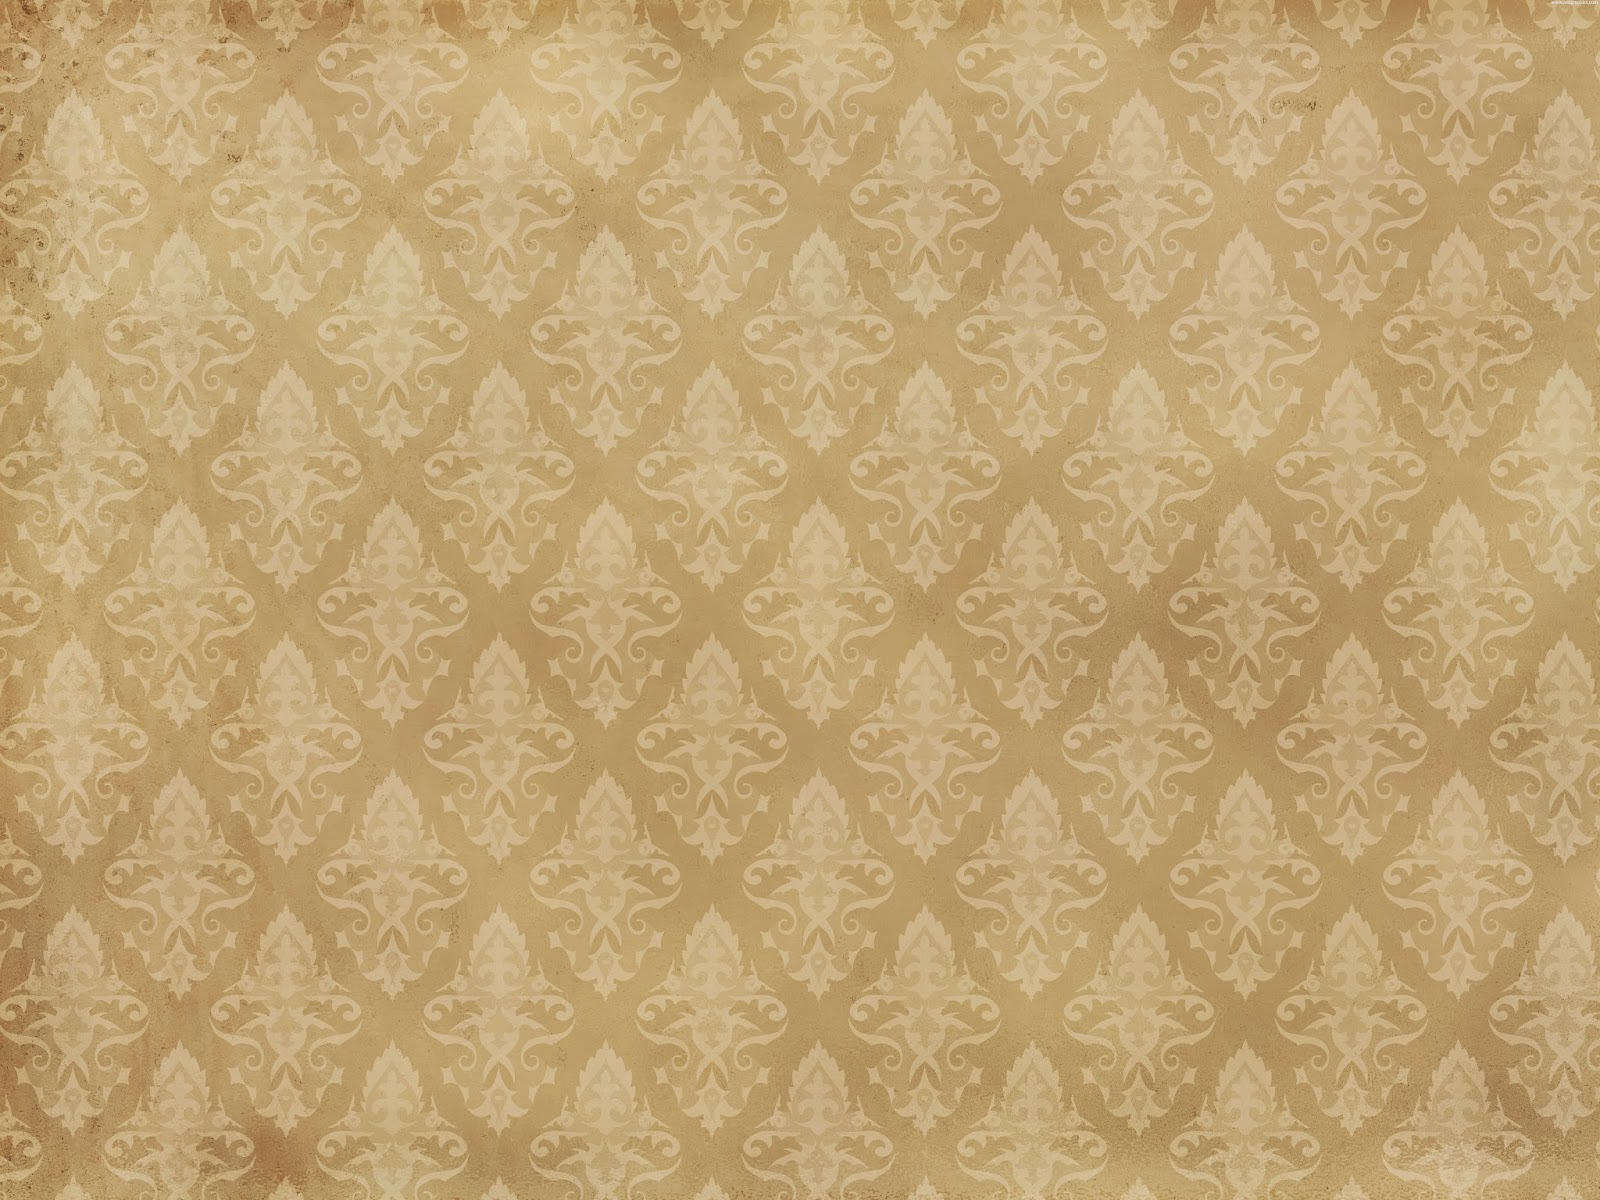 Imagetopia papel vintage fondos - Papel vintage pared ...